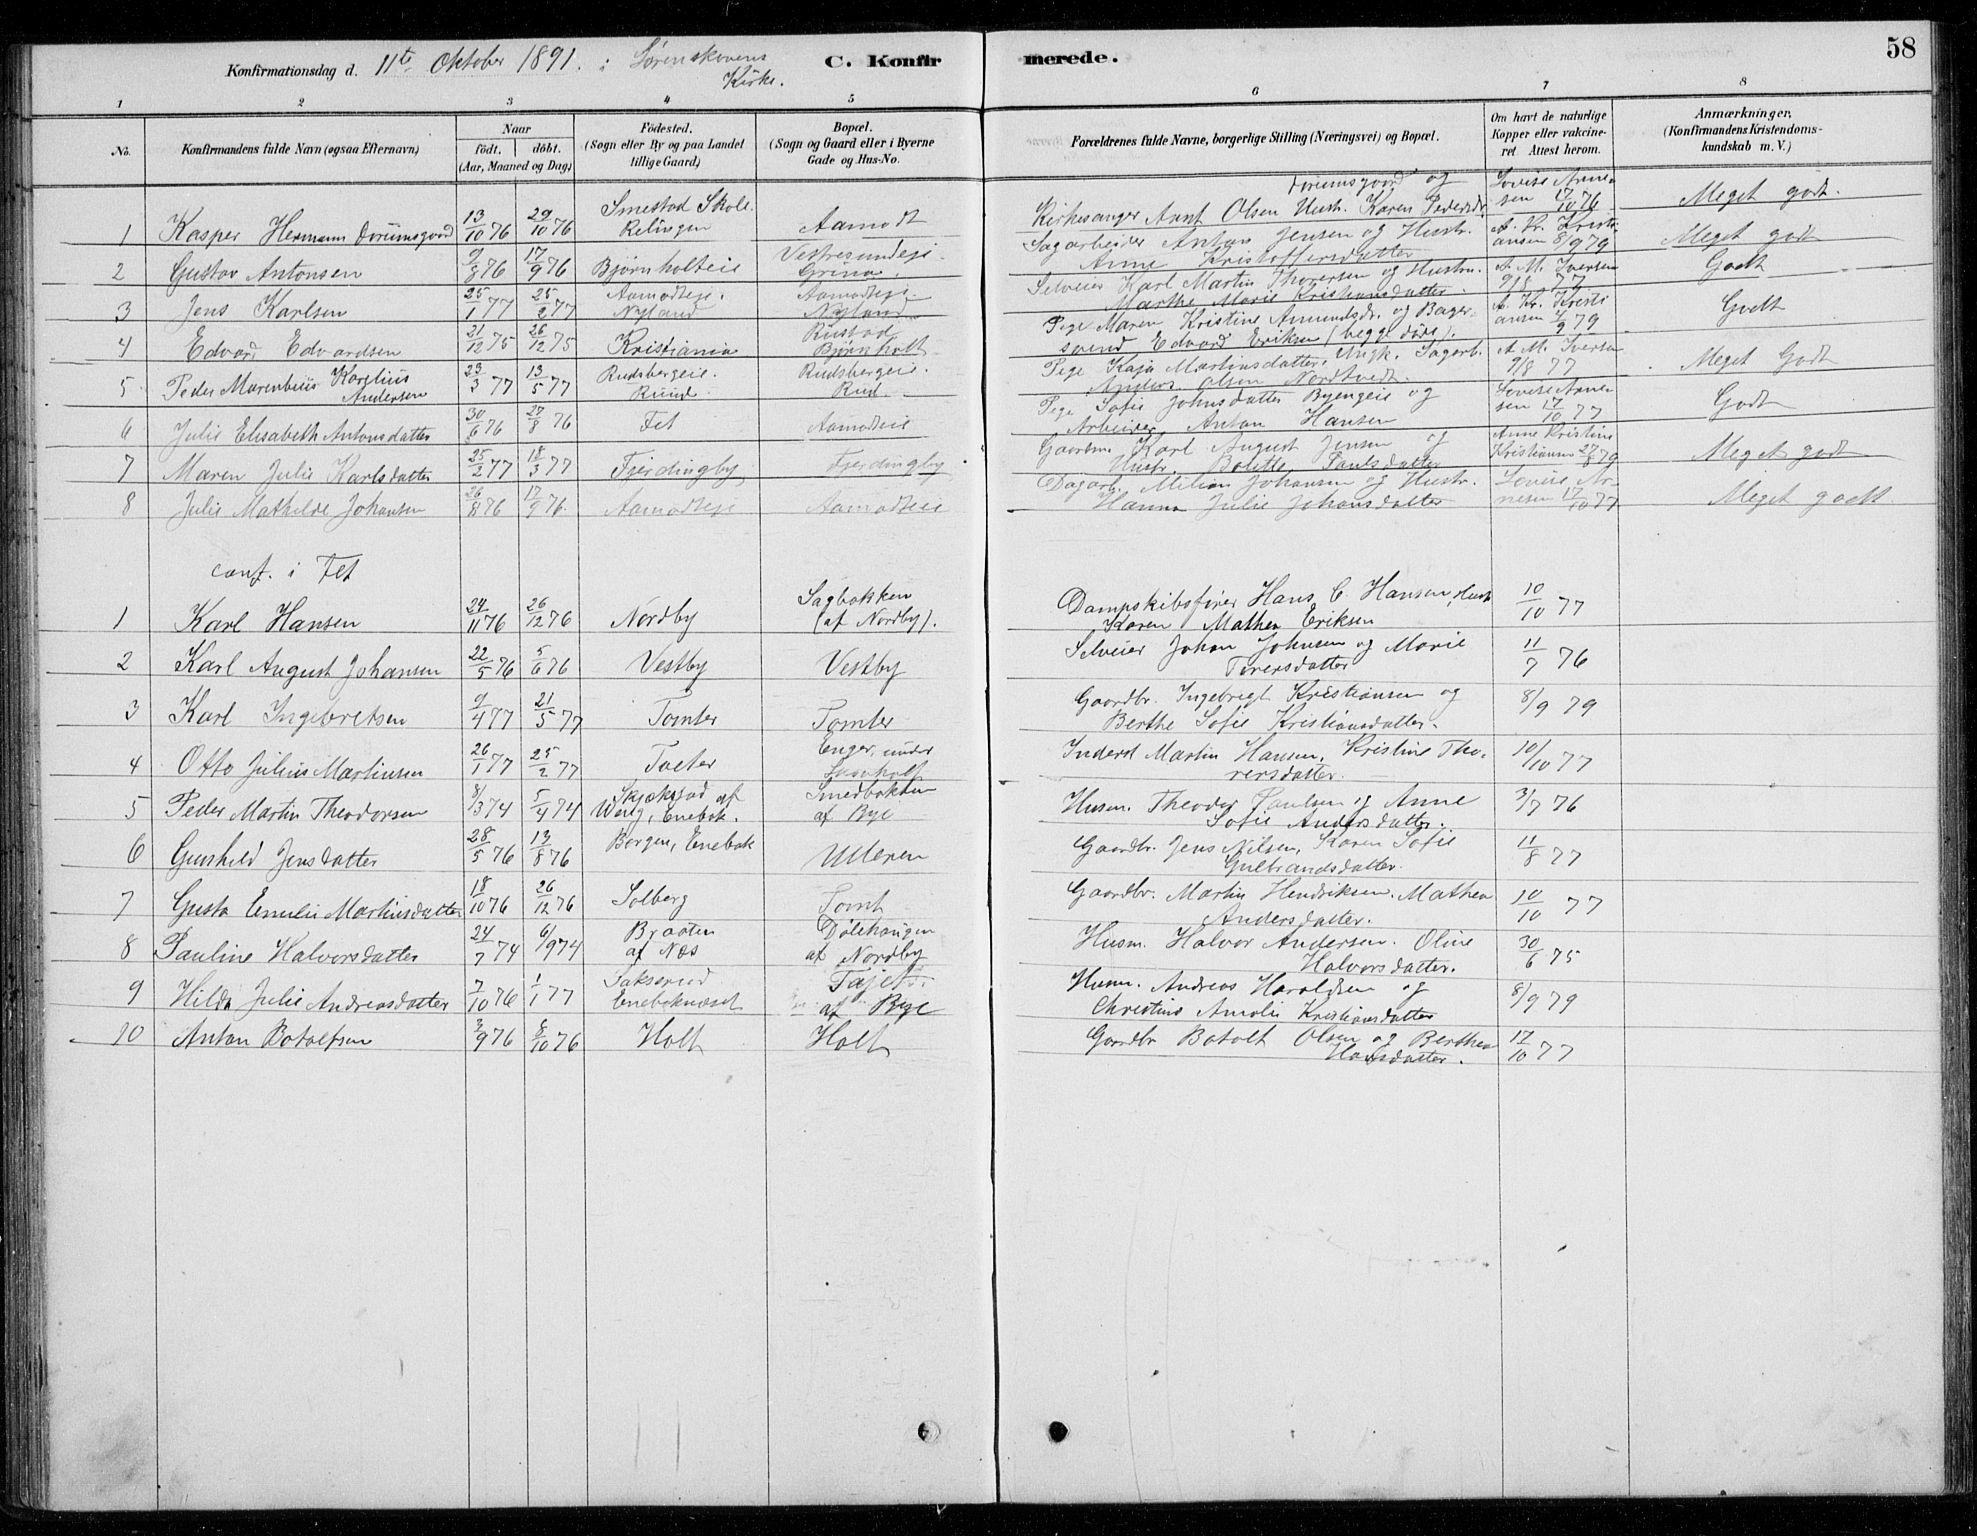 SAO, Fet prestekontor Kirkebøker, G/Gb/L0002: Parish register (copy) no. II 2, 1878-1911, p. 58